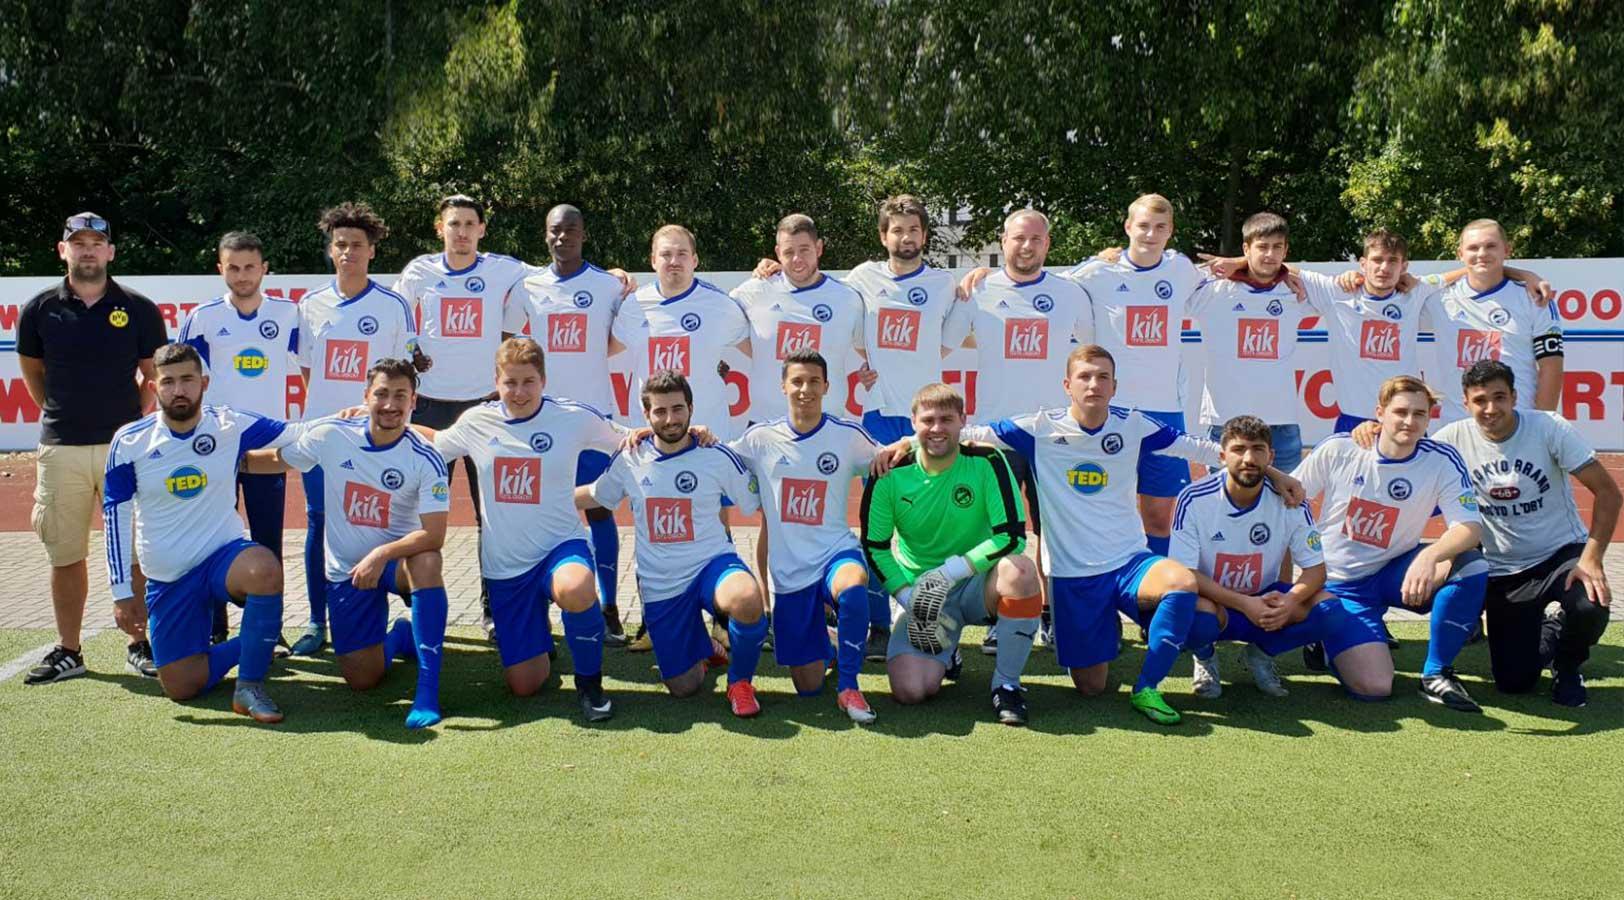 3. Herrenmannschaft des FC Brünninghausen, Saison 2018, Dortmund